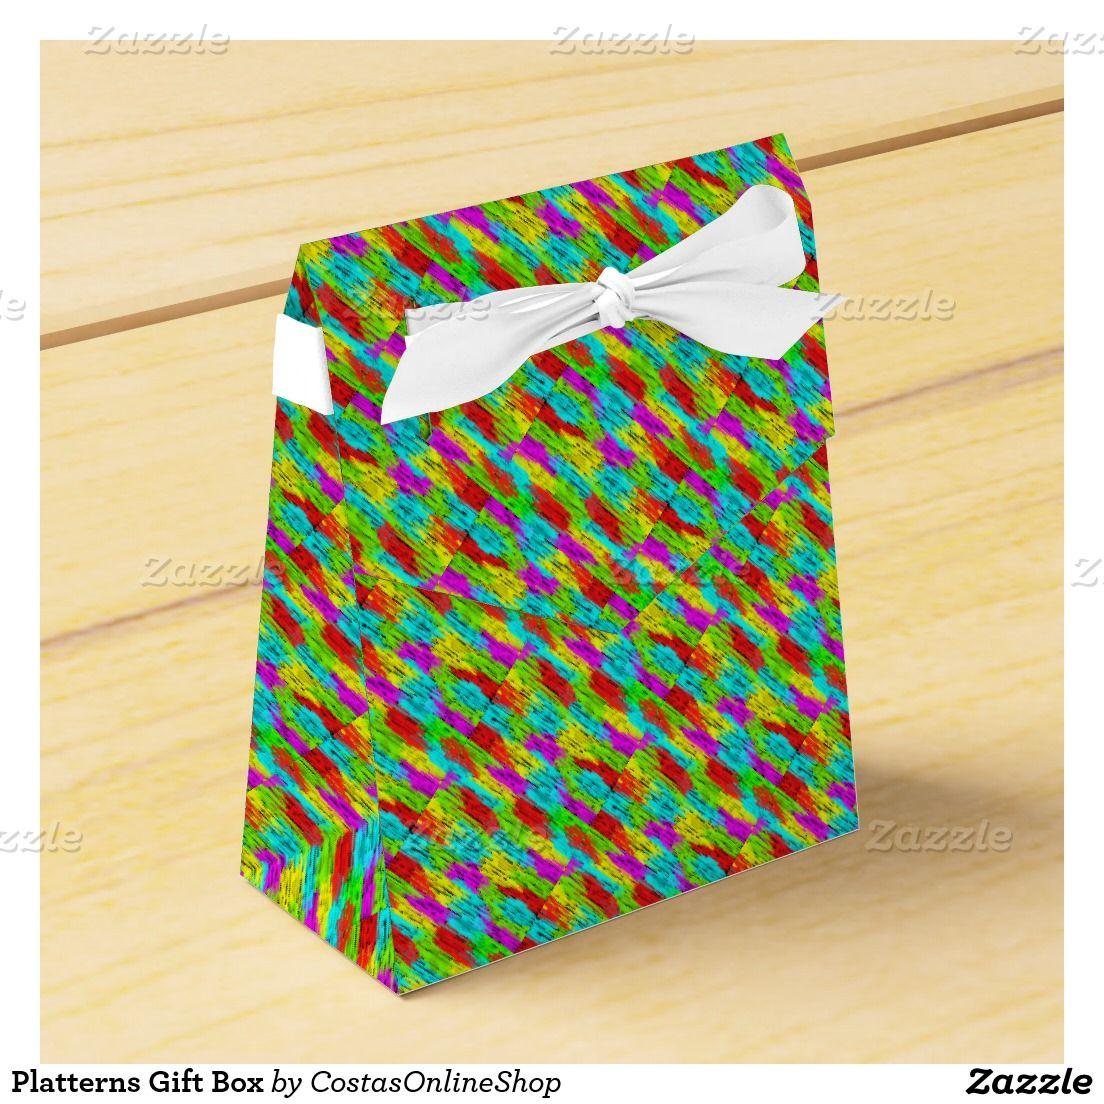 Geschenkschachteln kaufen, bunte Geschenkpackungen,,Geschenkkartons